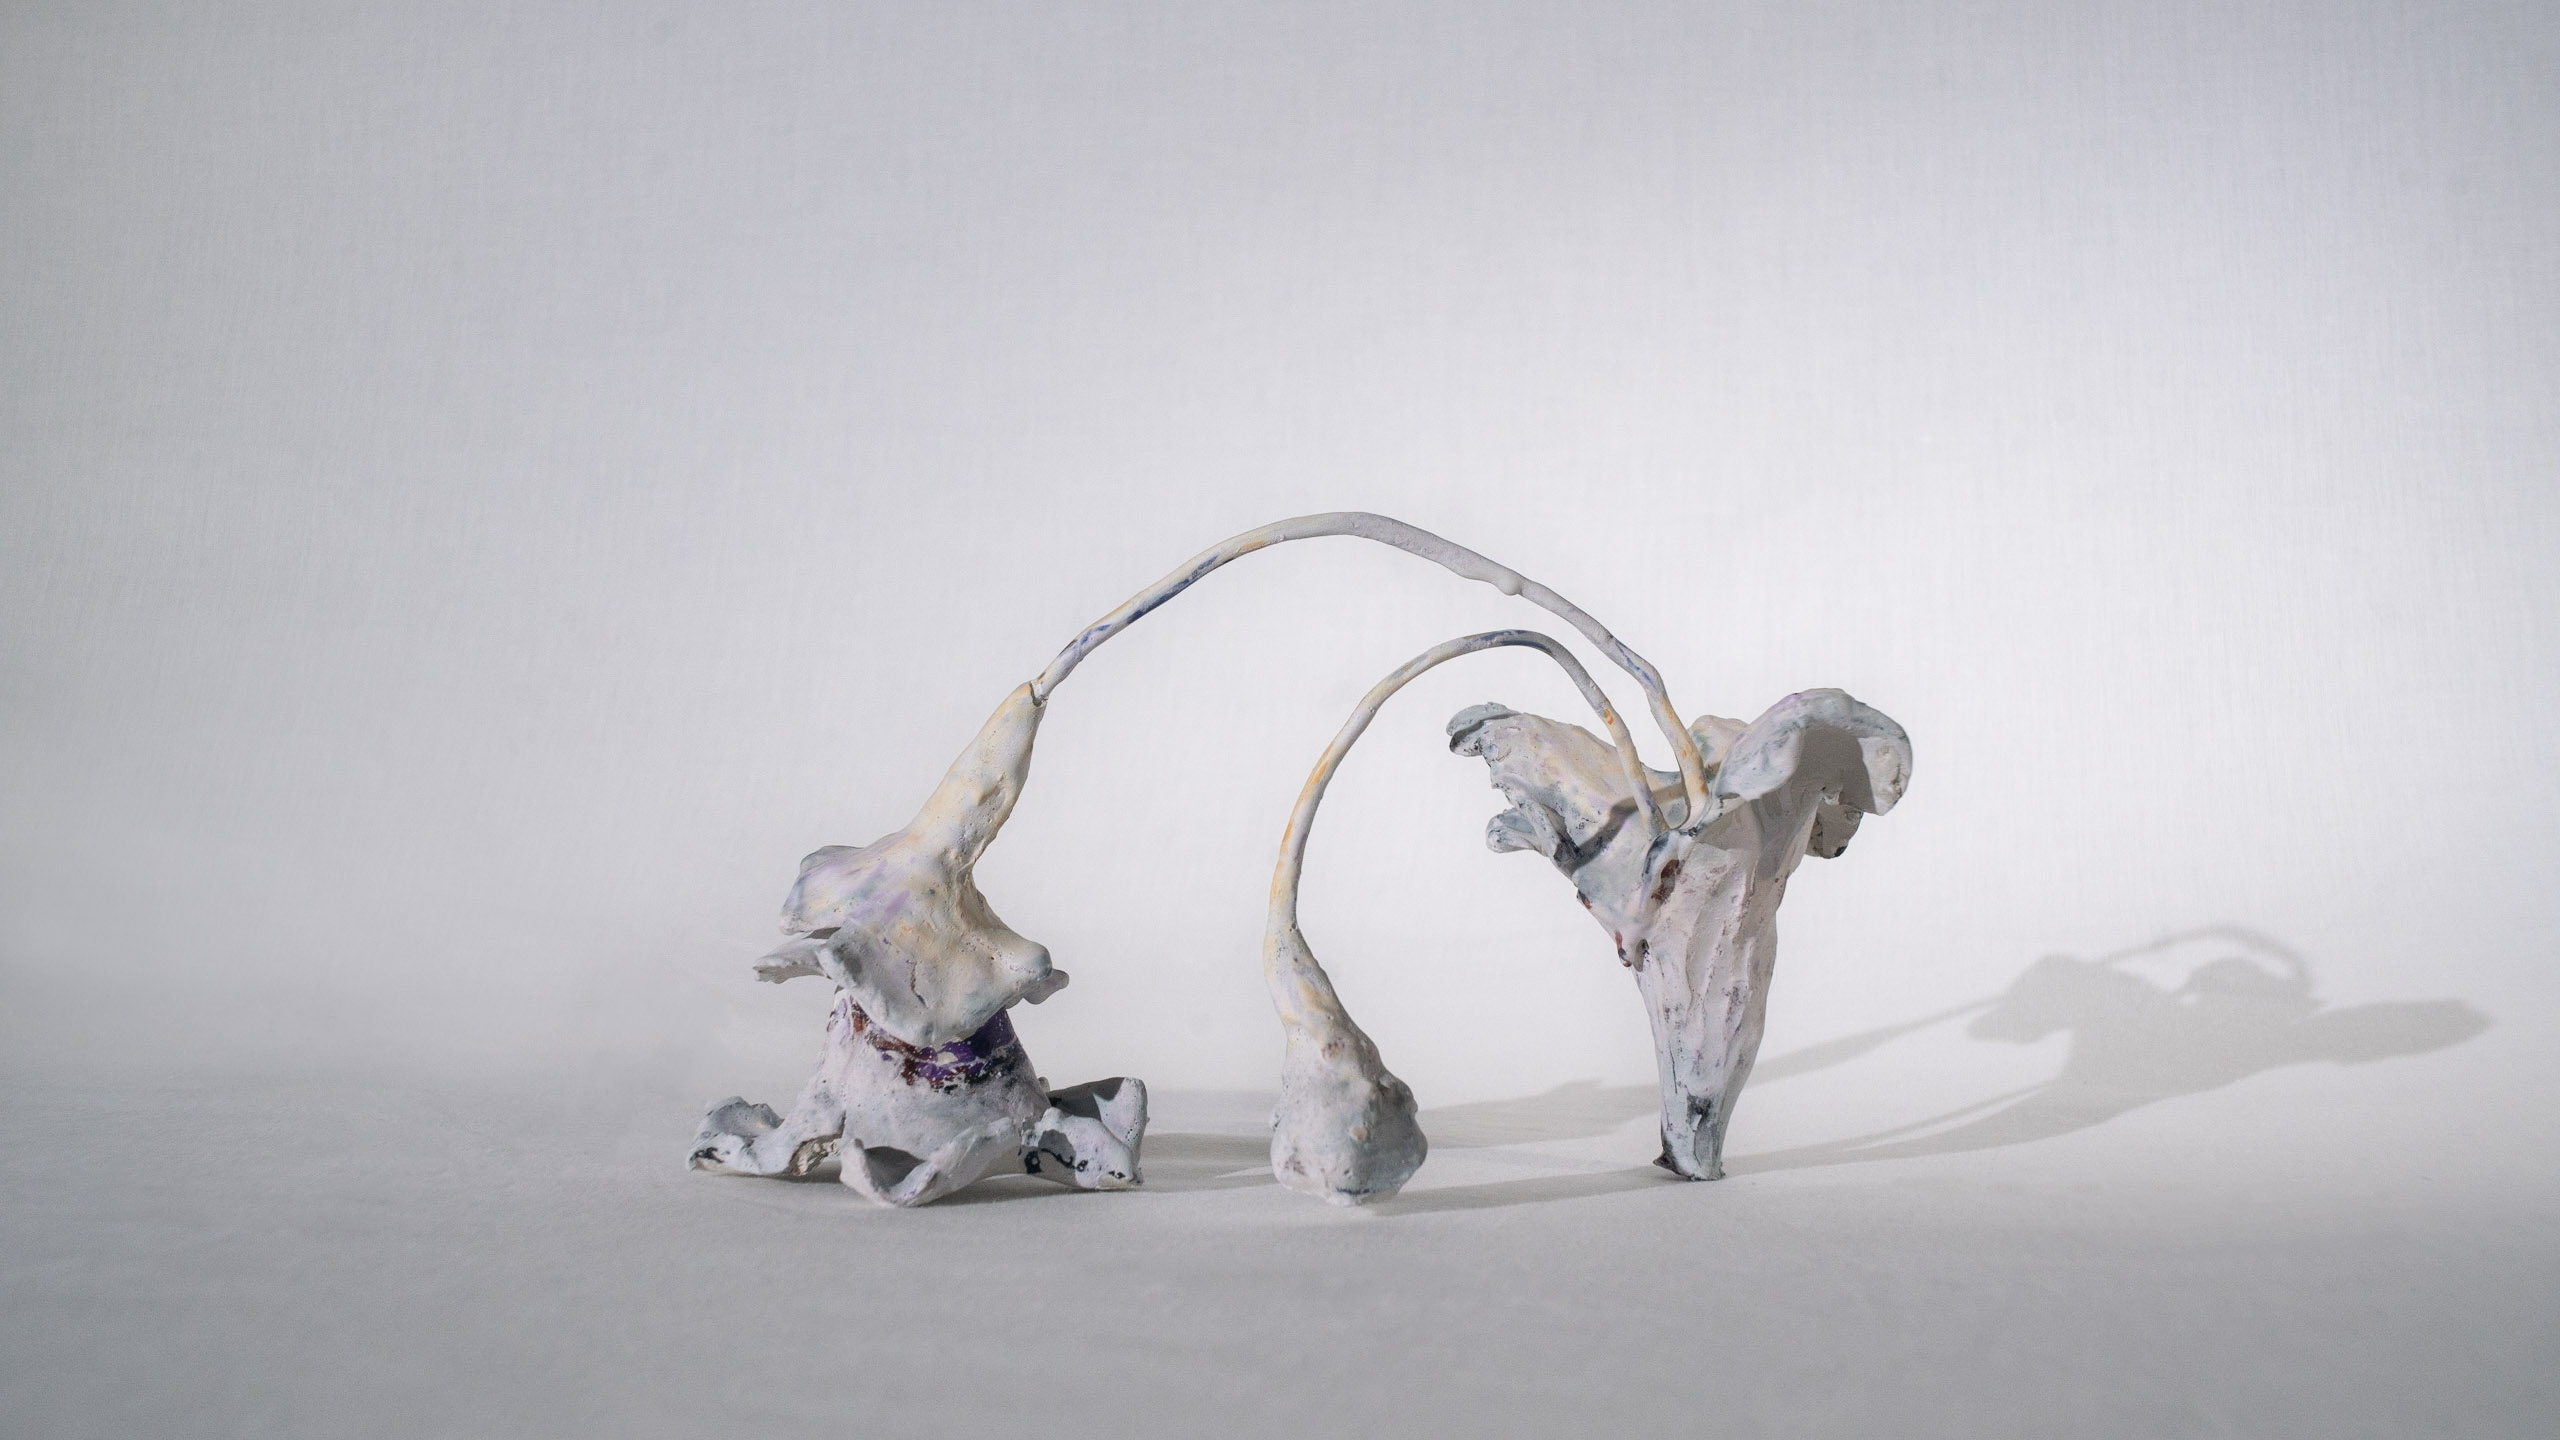 Small clay flower sculpture by artist Carrie Ruddick.